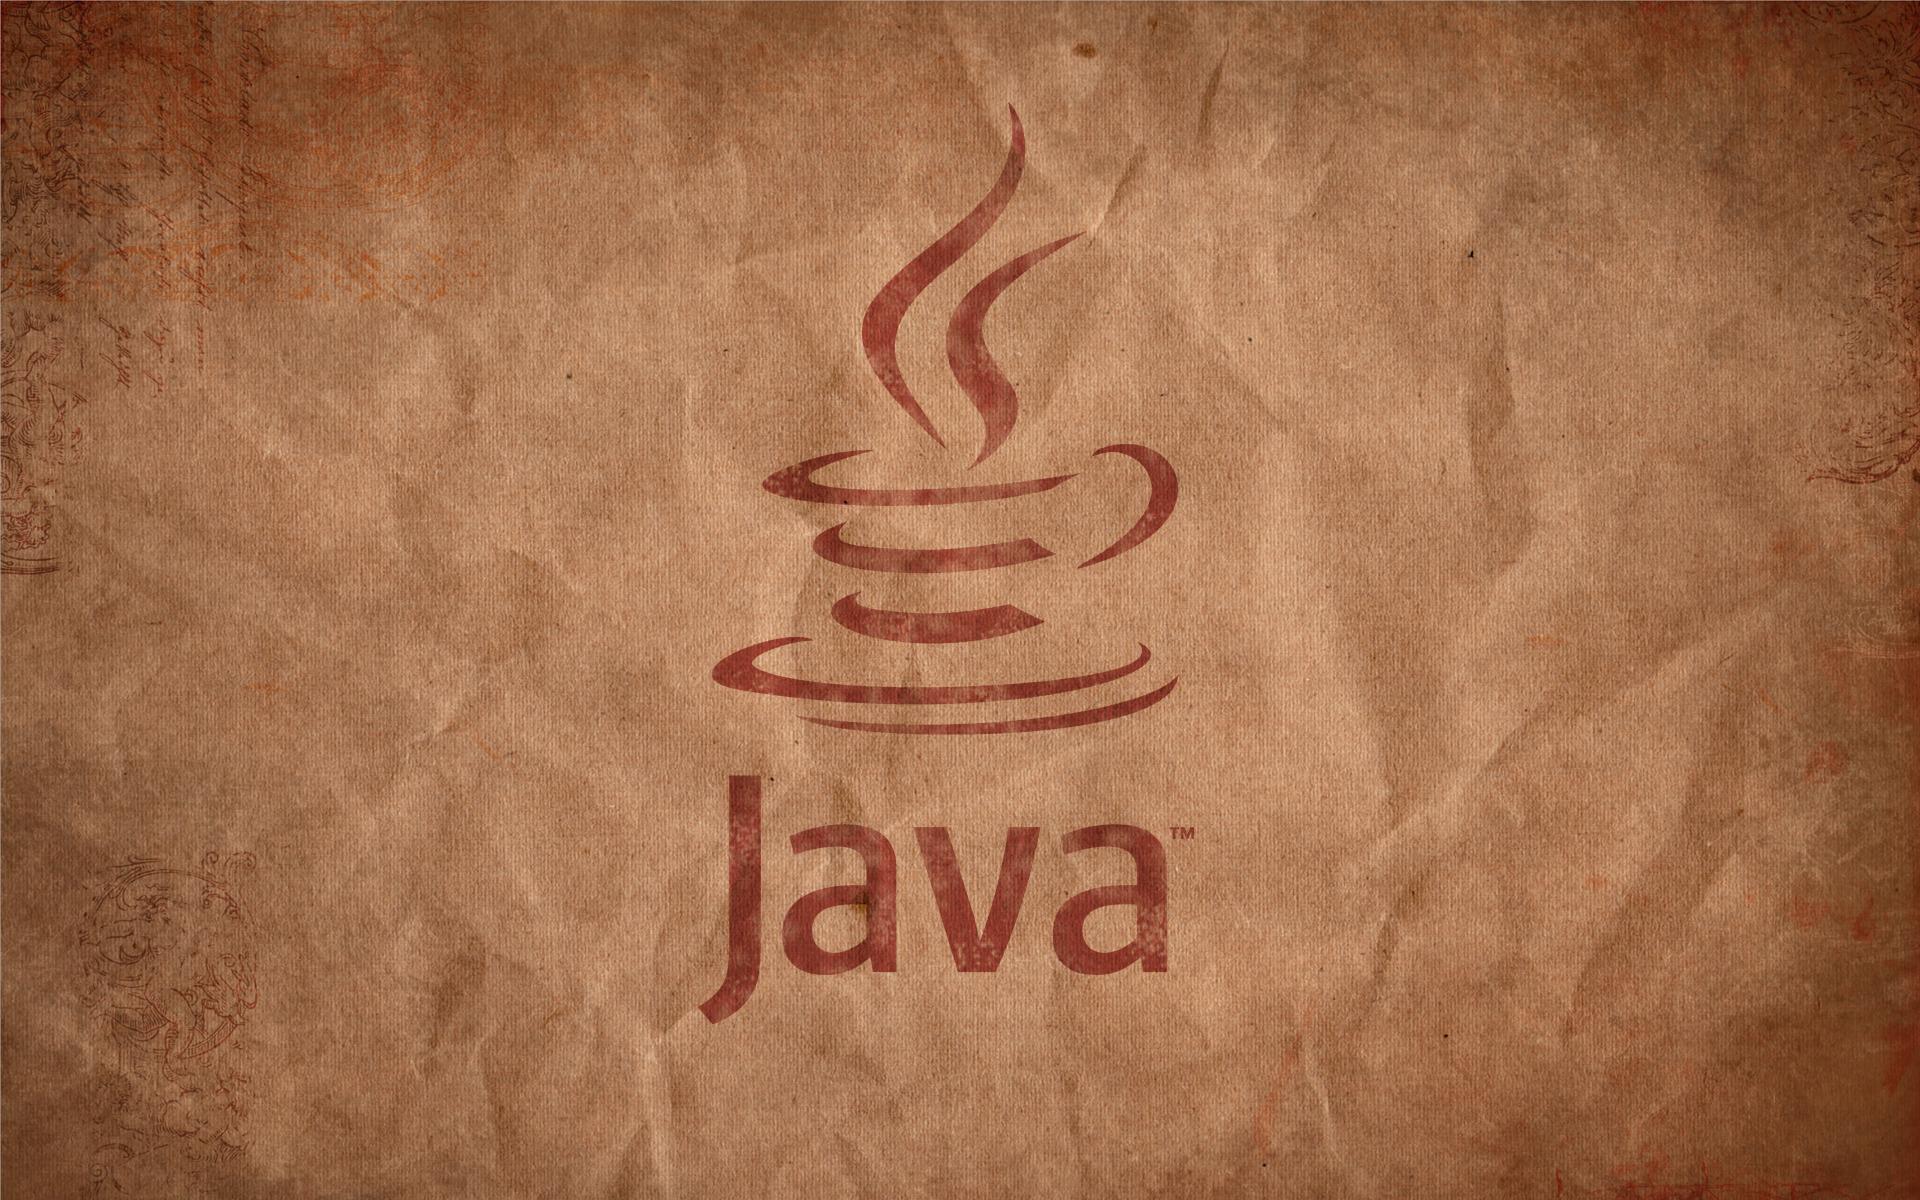 java中==和equals的区别